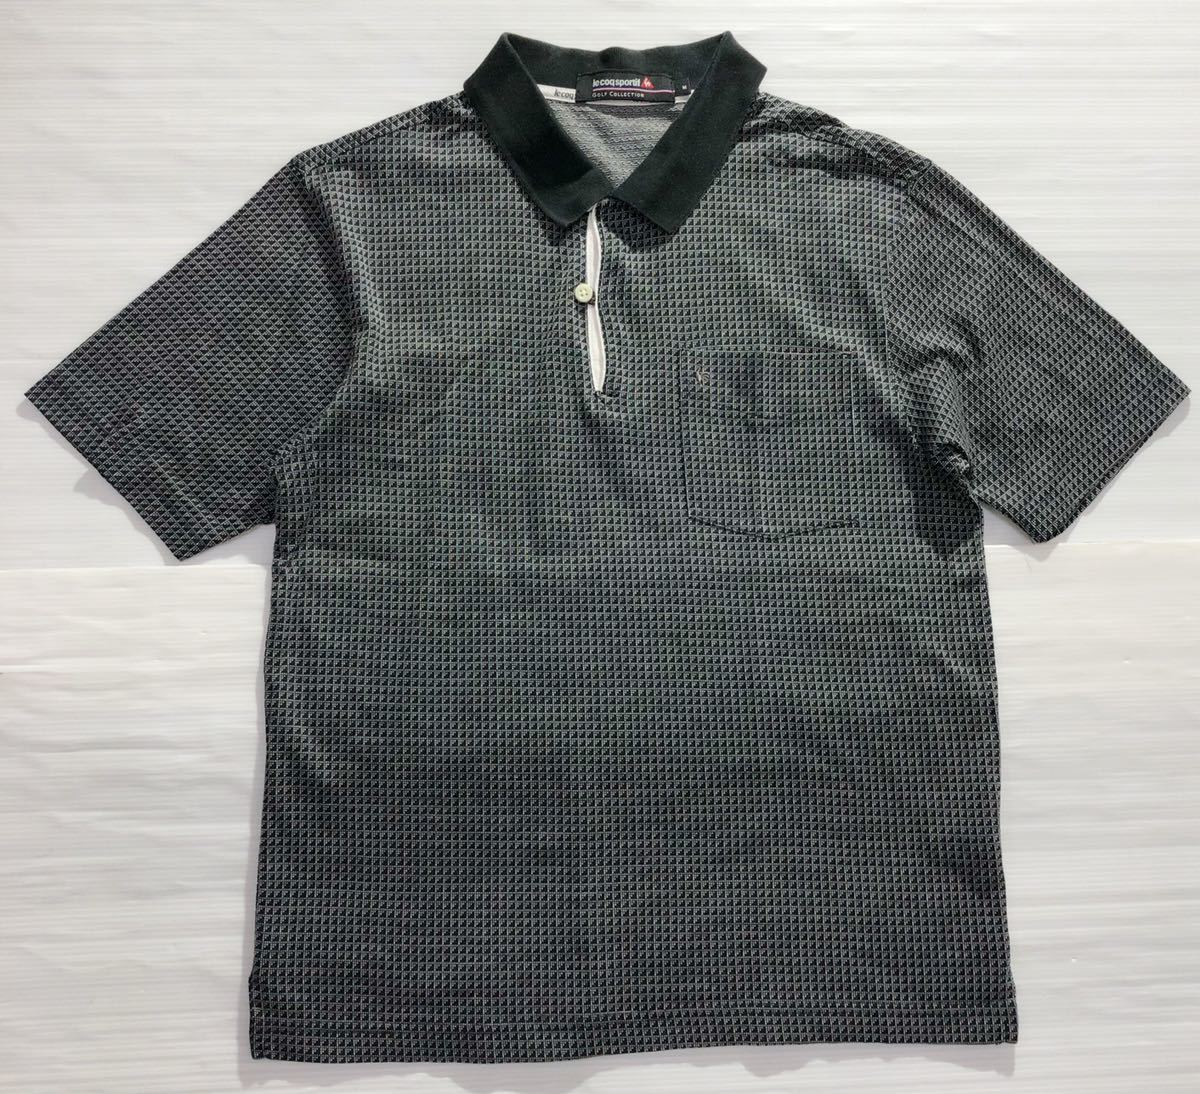 《le coq sportif GOLF ルコックゴルフ》ロゴ刺繍 総柄 半袖 ポロシャツ グレー×ブラック M_画像1